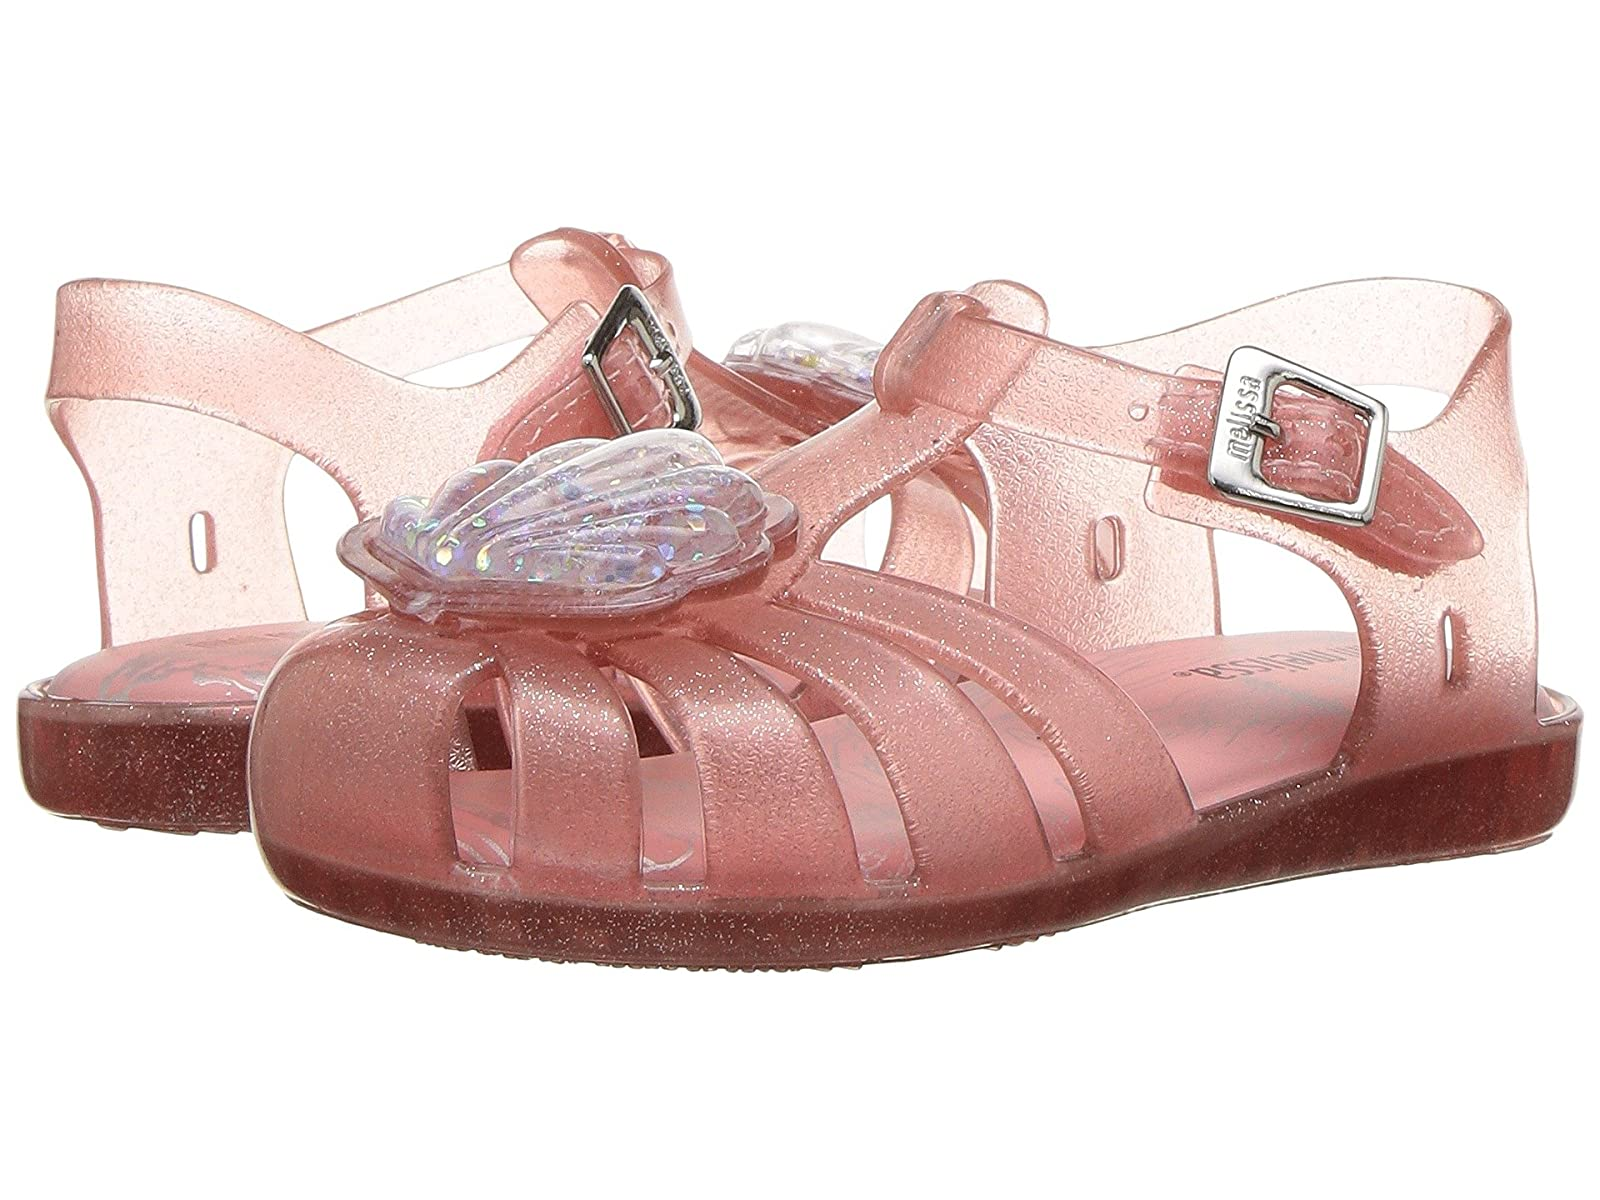 Mini Melissa Mini Aranha XII (Toddler/Little Kid)Atmospheric grades have affordable shoes